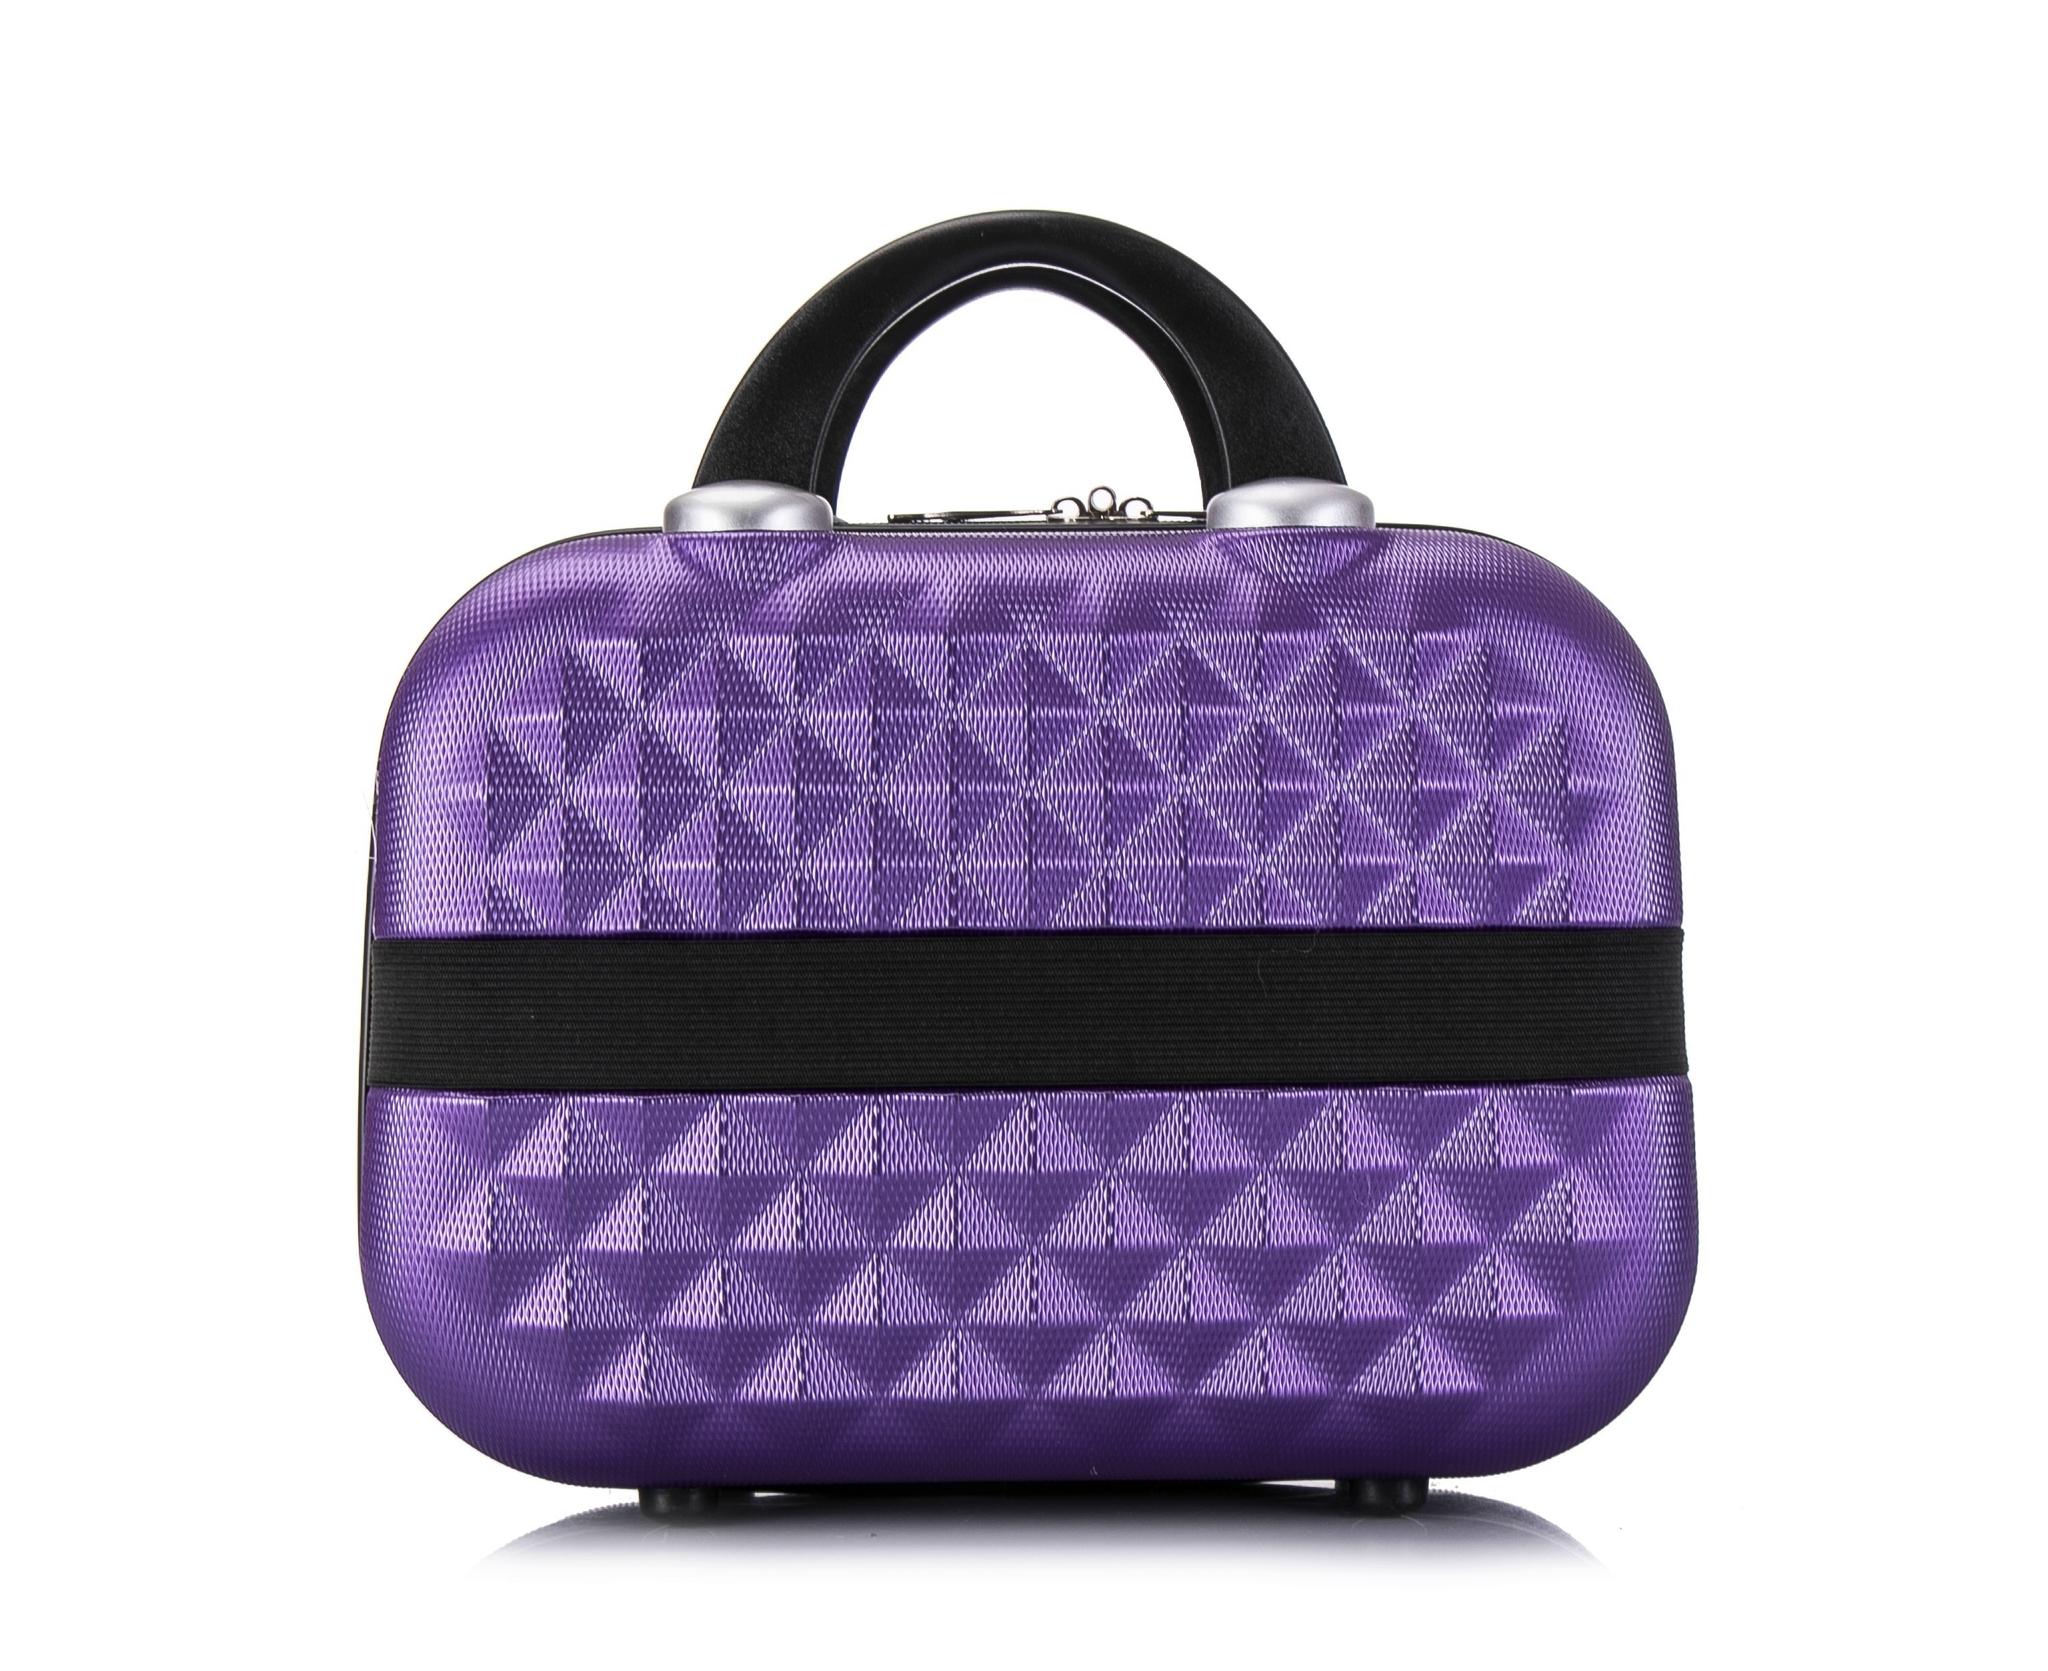 Бьюти-кейс Phatthaya Фиолетовый